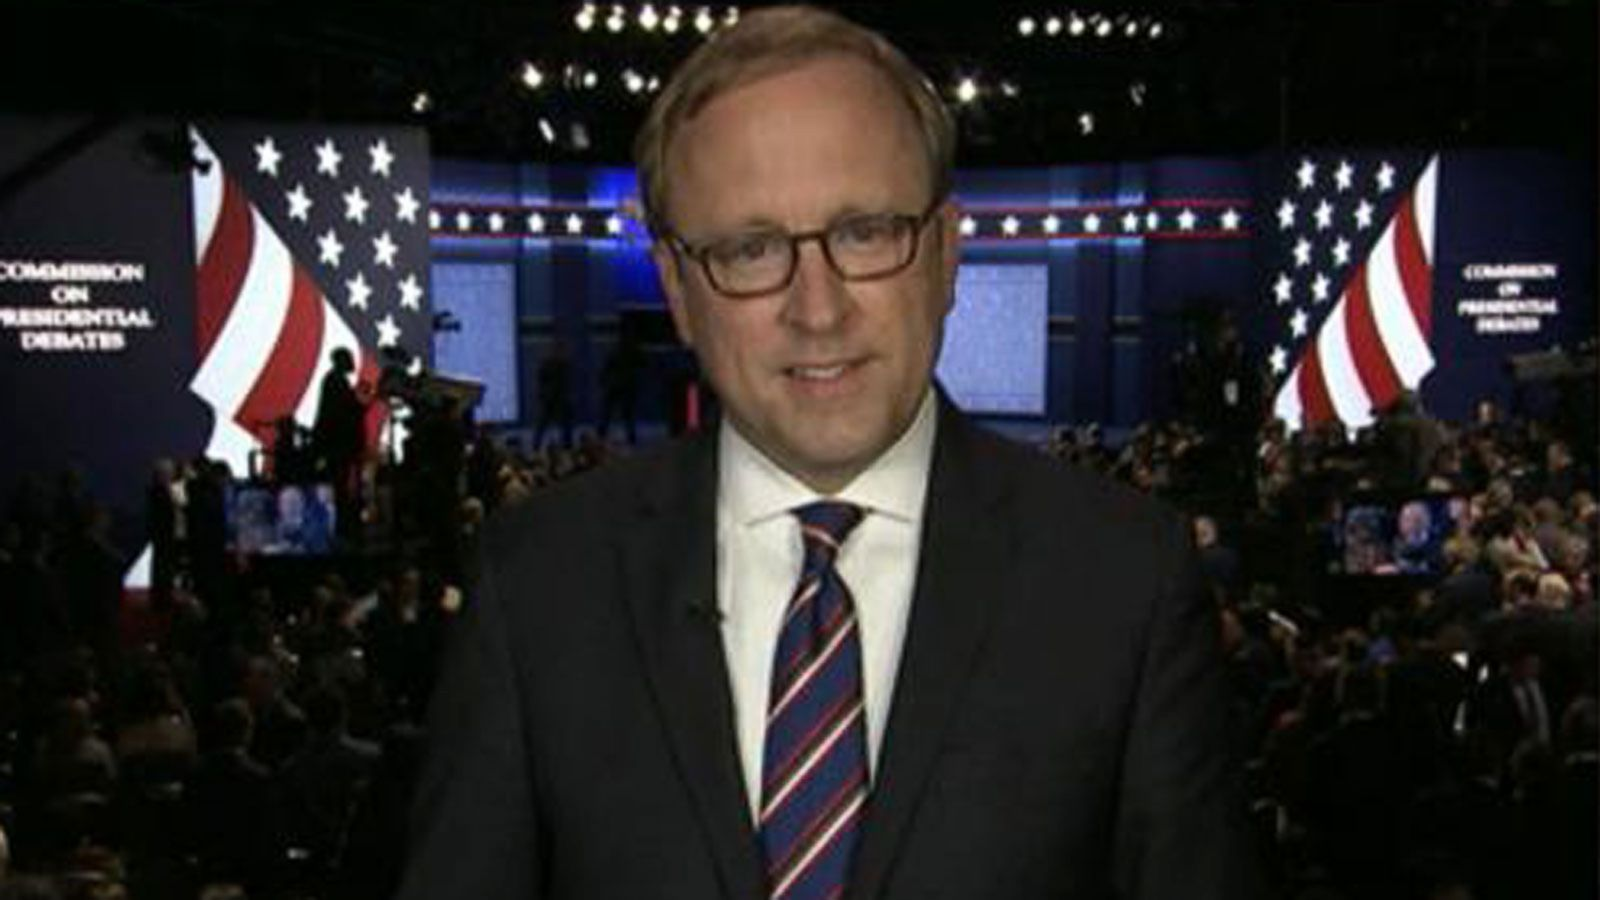 VIDEO: Jon Karl Predicts a 'Restrained' Donald Trump